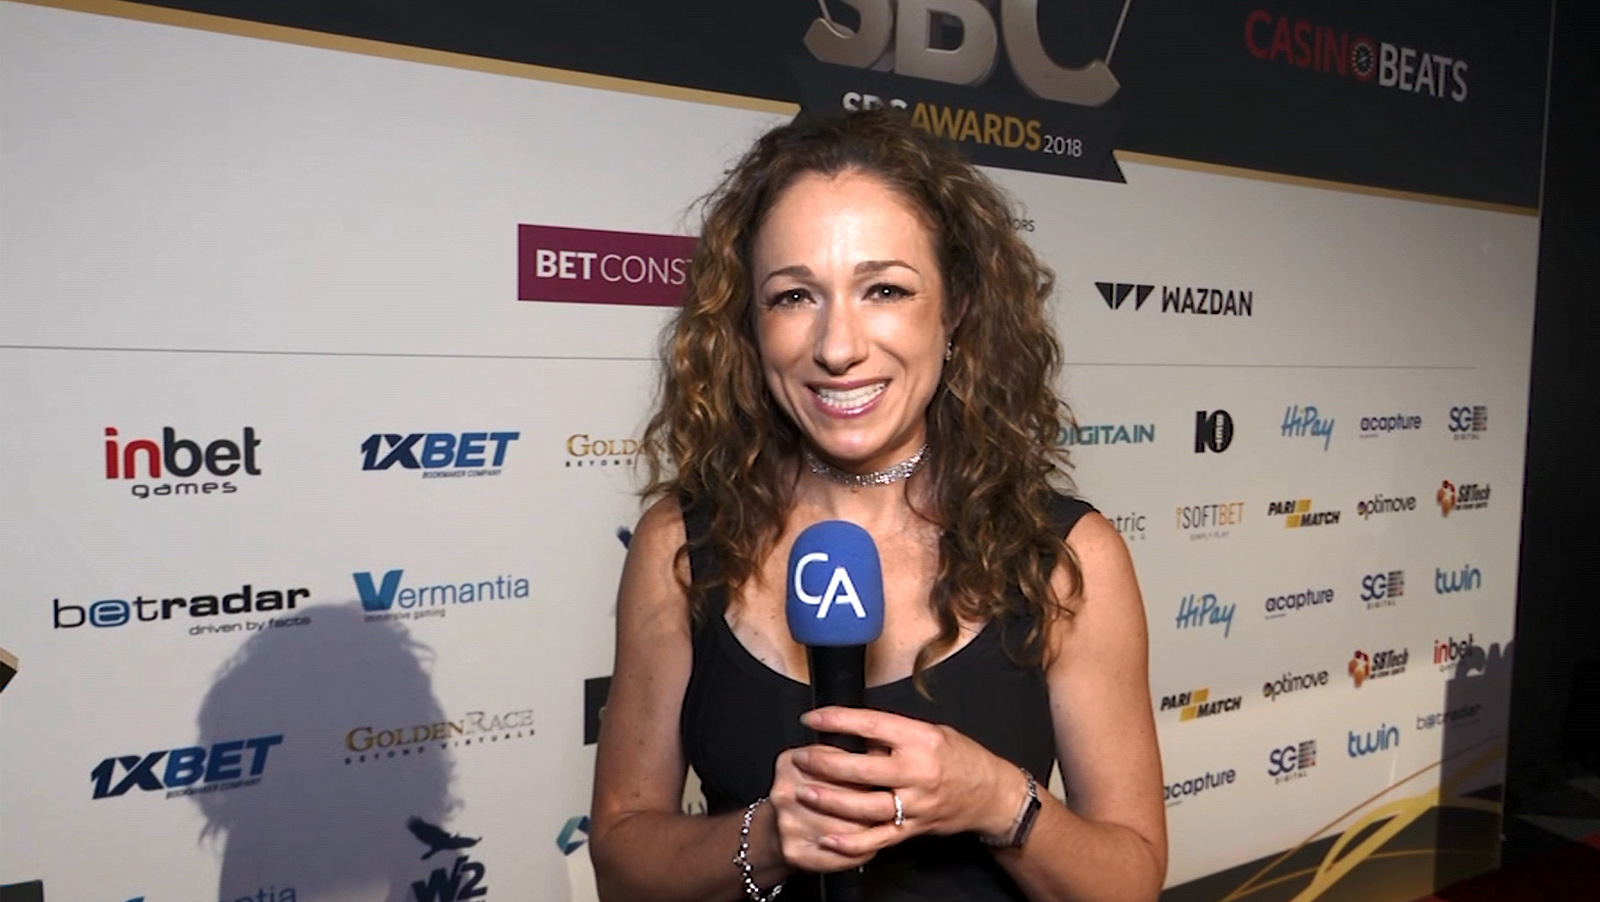 SBC Awards 2018 Highlights